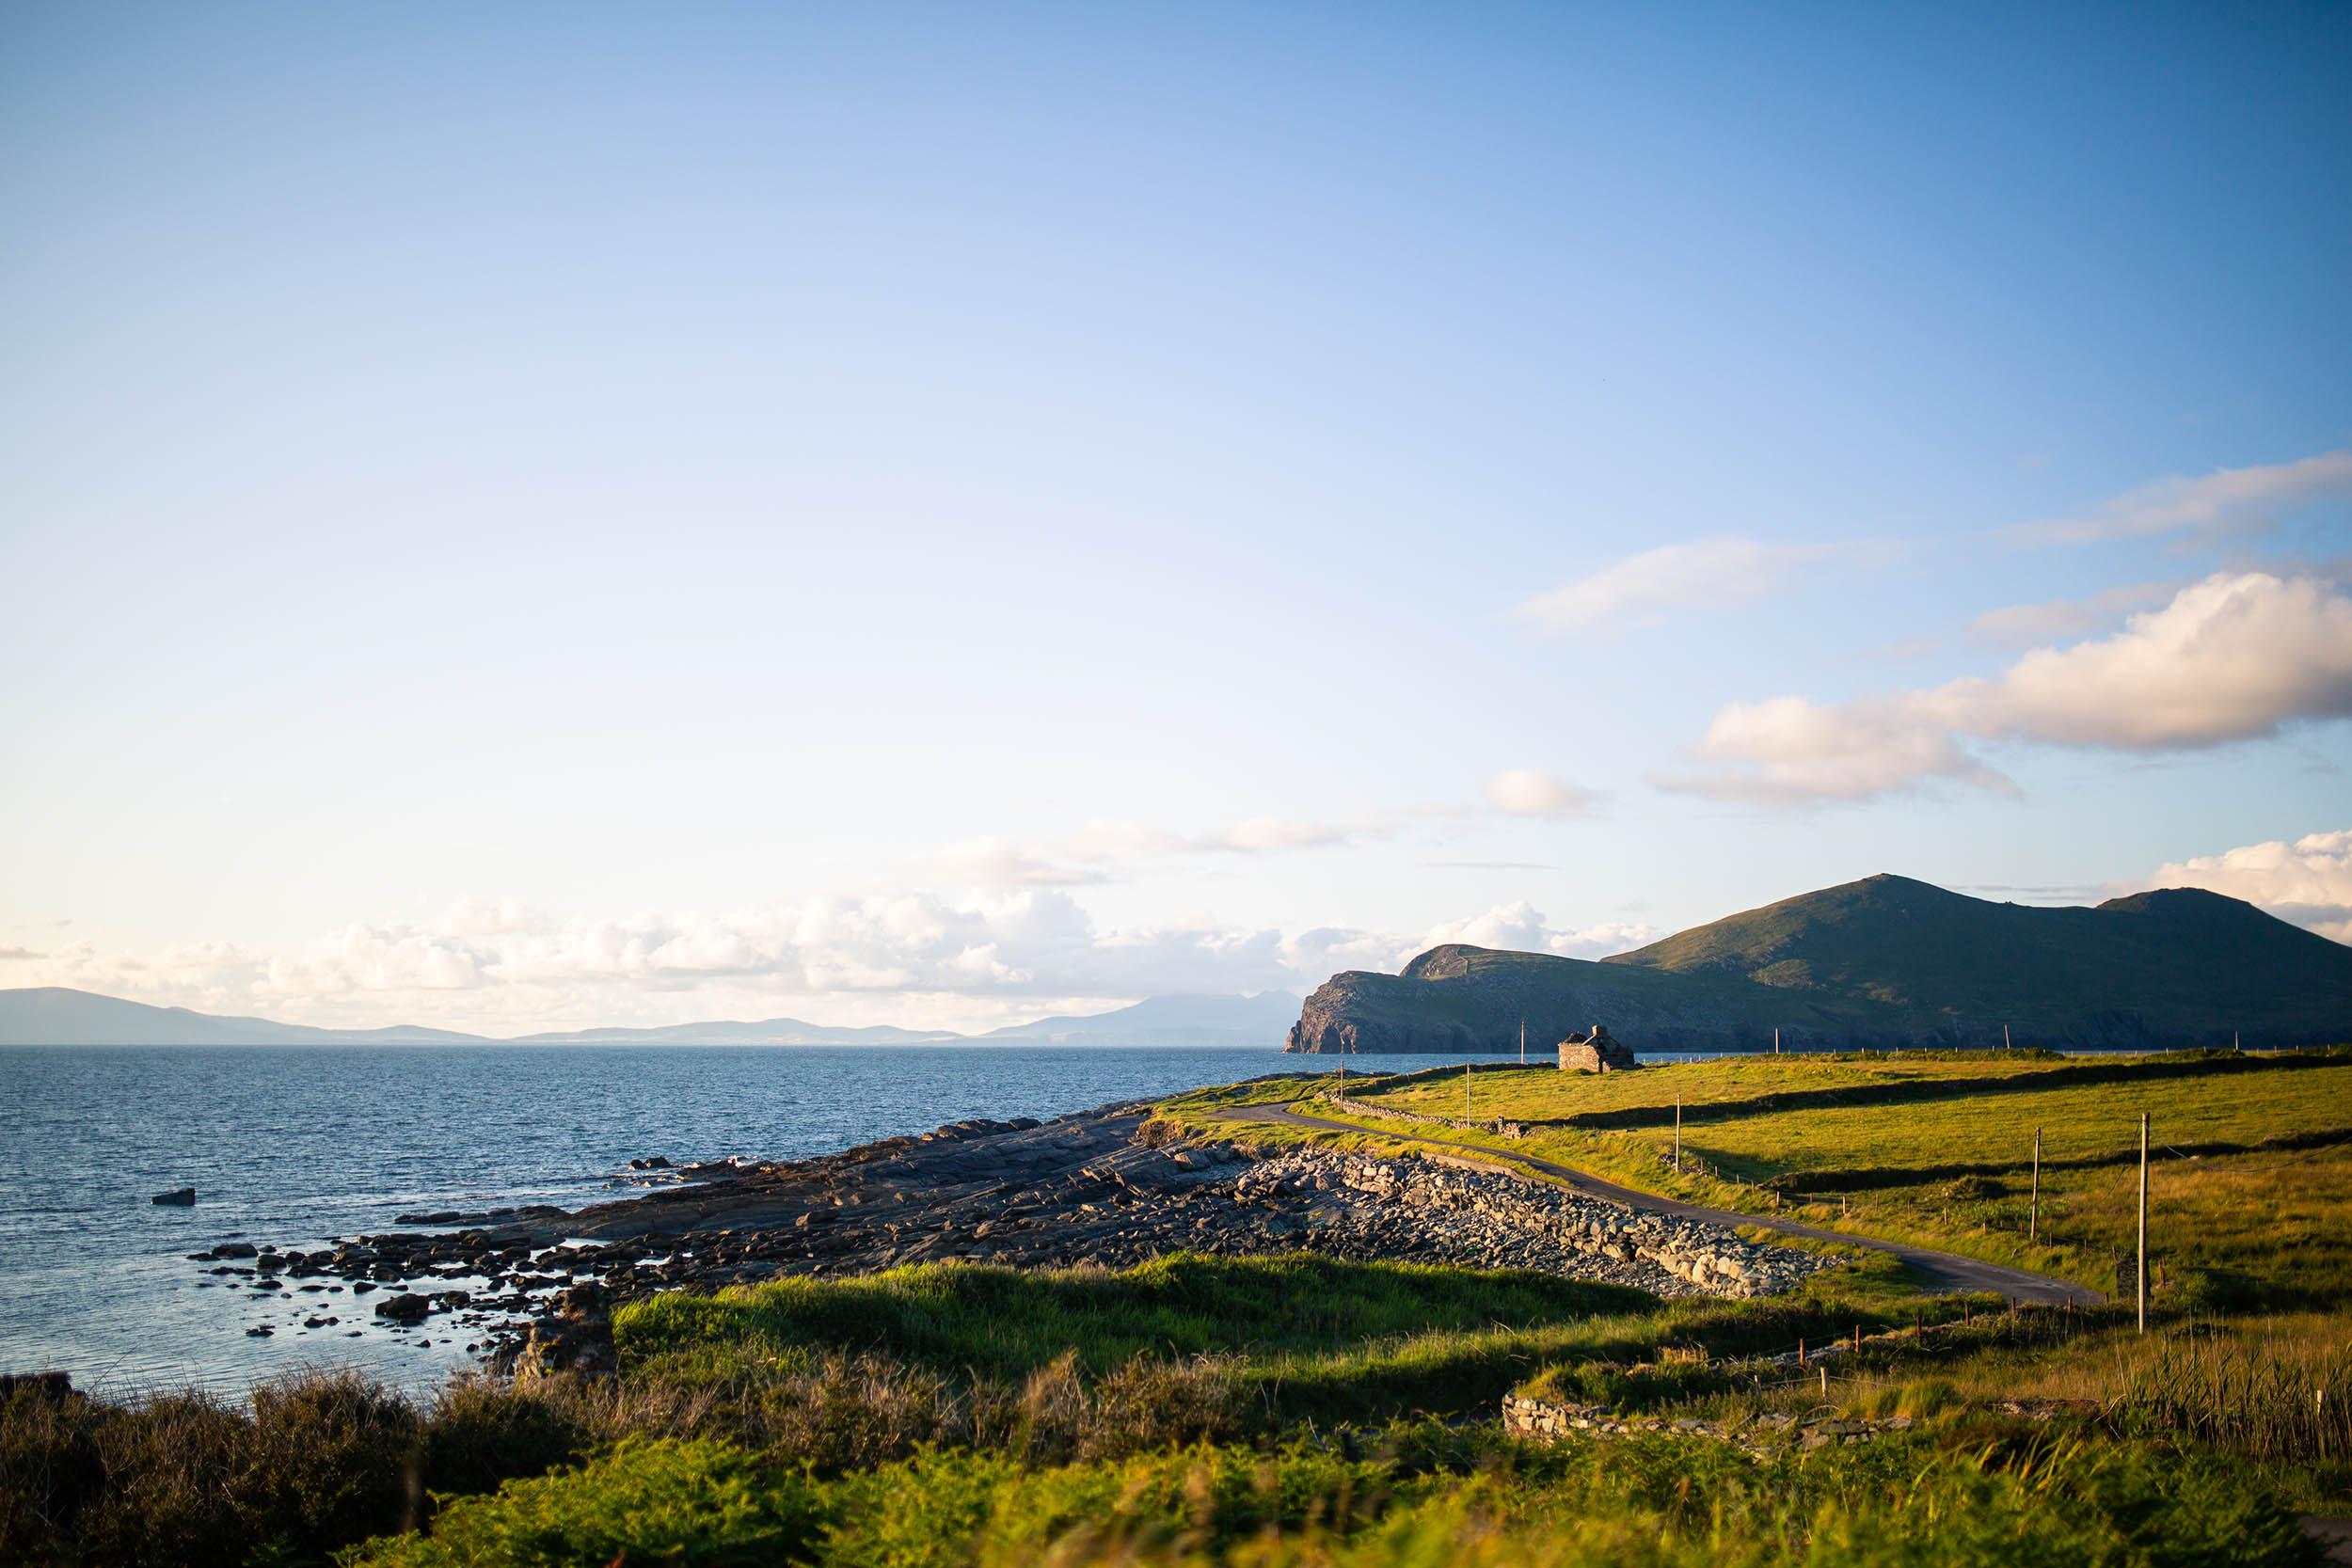 IRELAND_KERRY_VALENTIAISLAND_0023